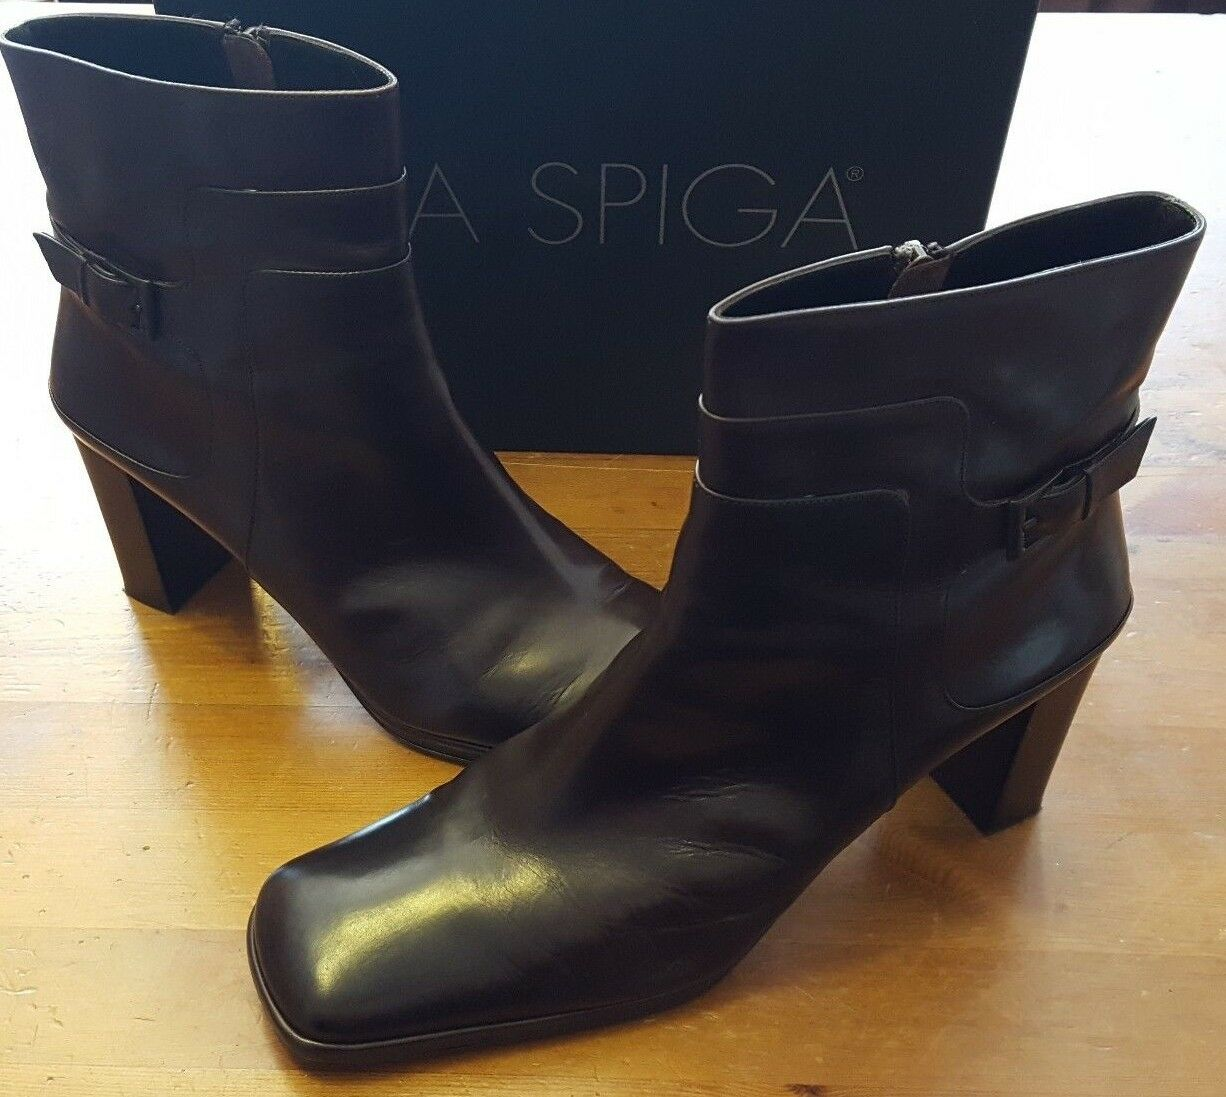 Via Spiga - Sperrin, Brown, Kerala Calf Leather, Ankle Boots (Size 10 B)